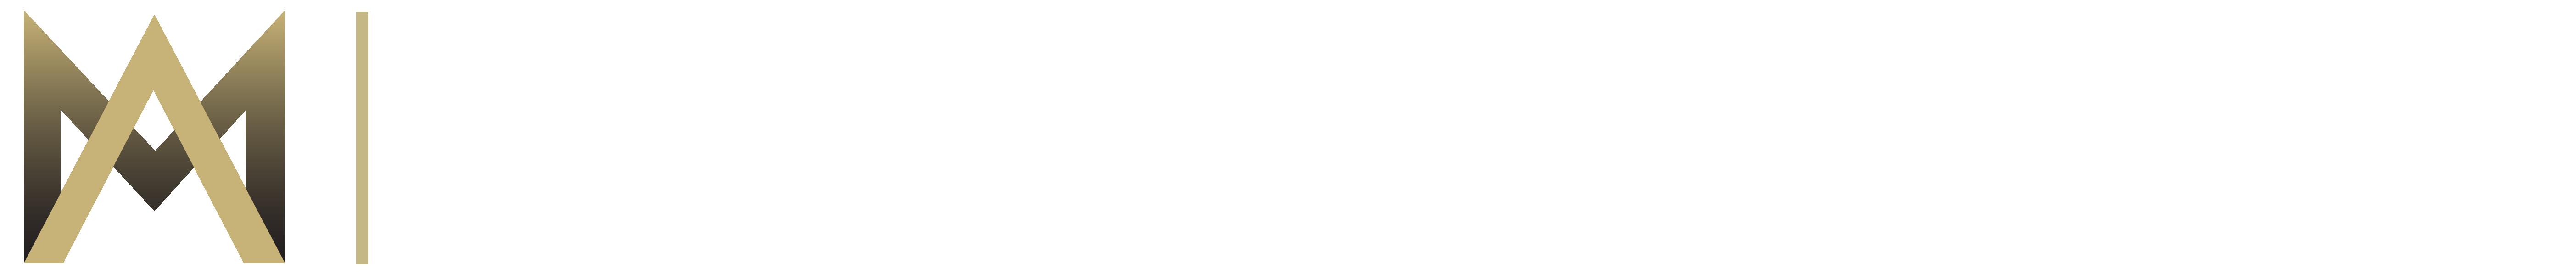 Digital explora logo